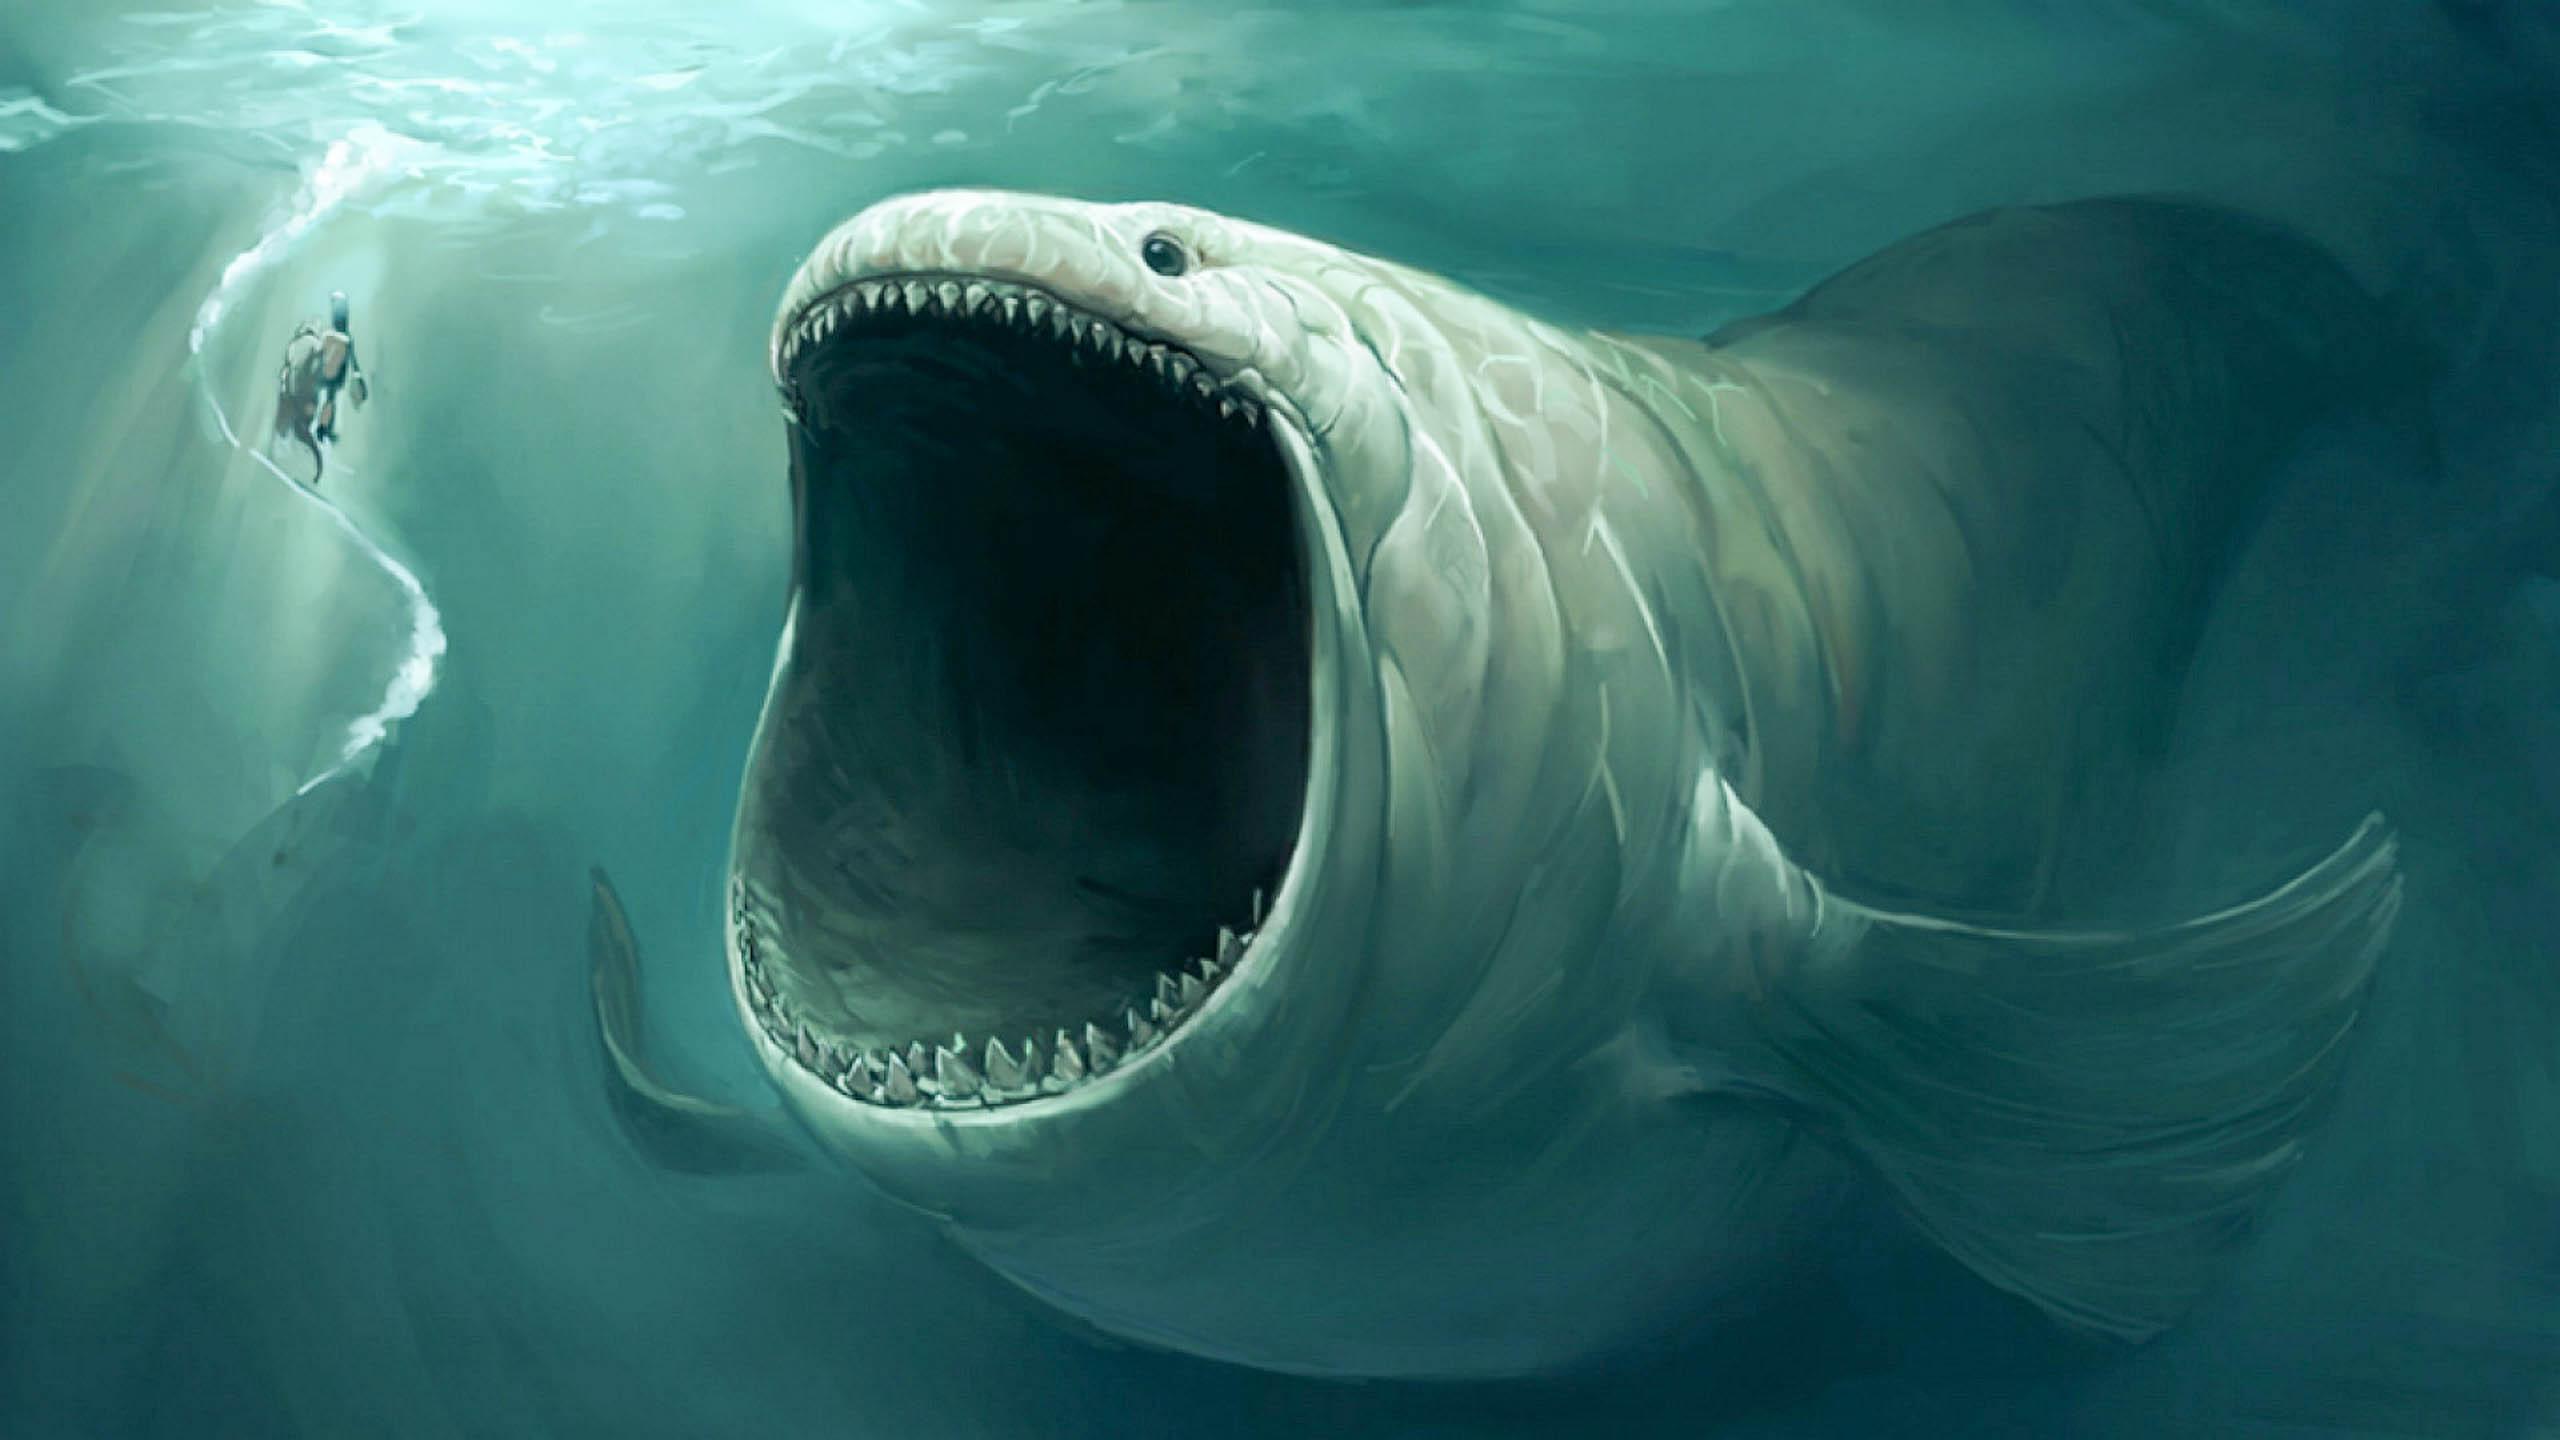 High Resolution Wallpaper | Sea Monster 2560x1440 px